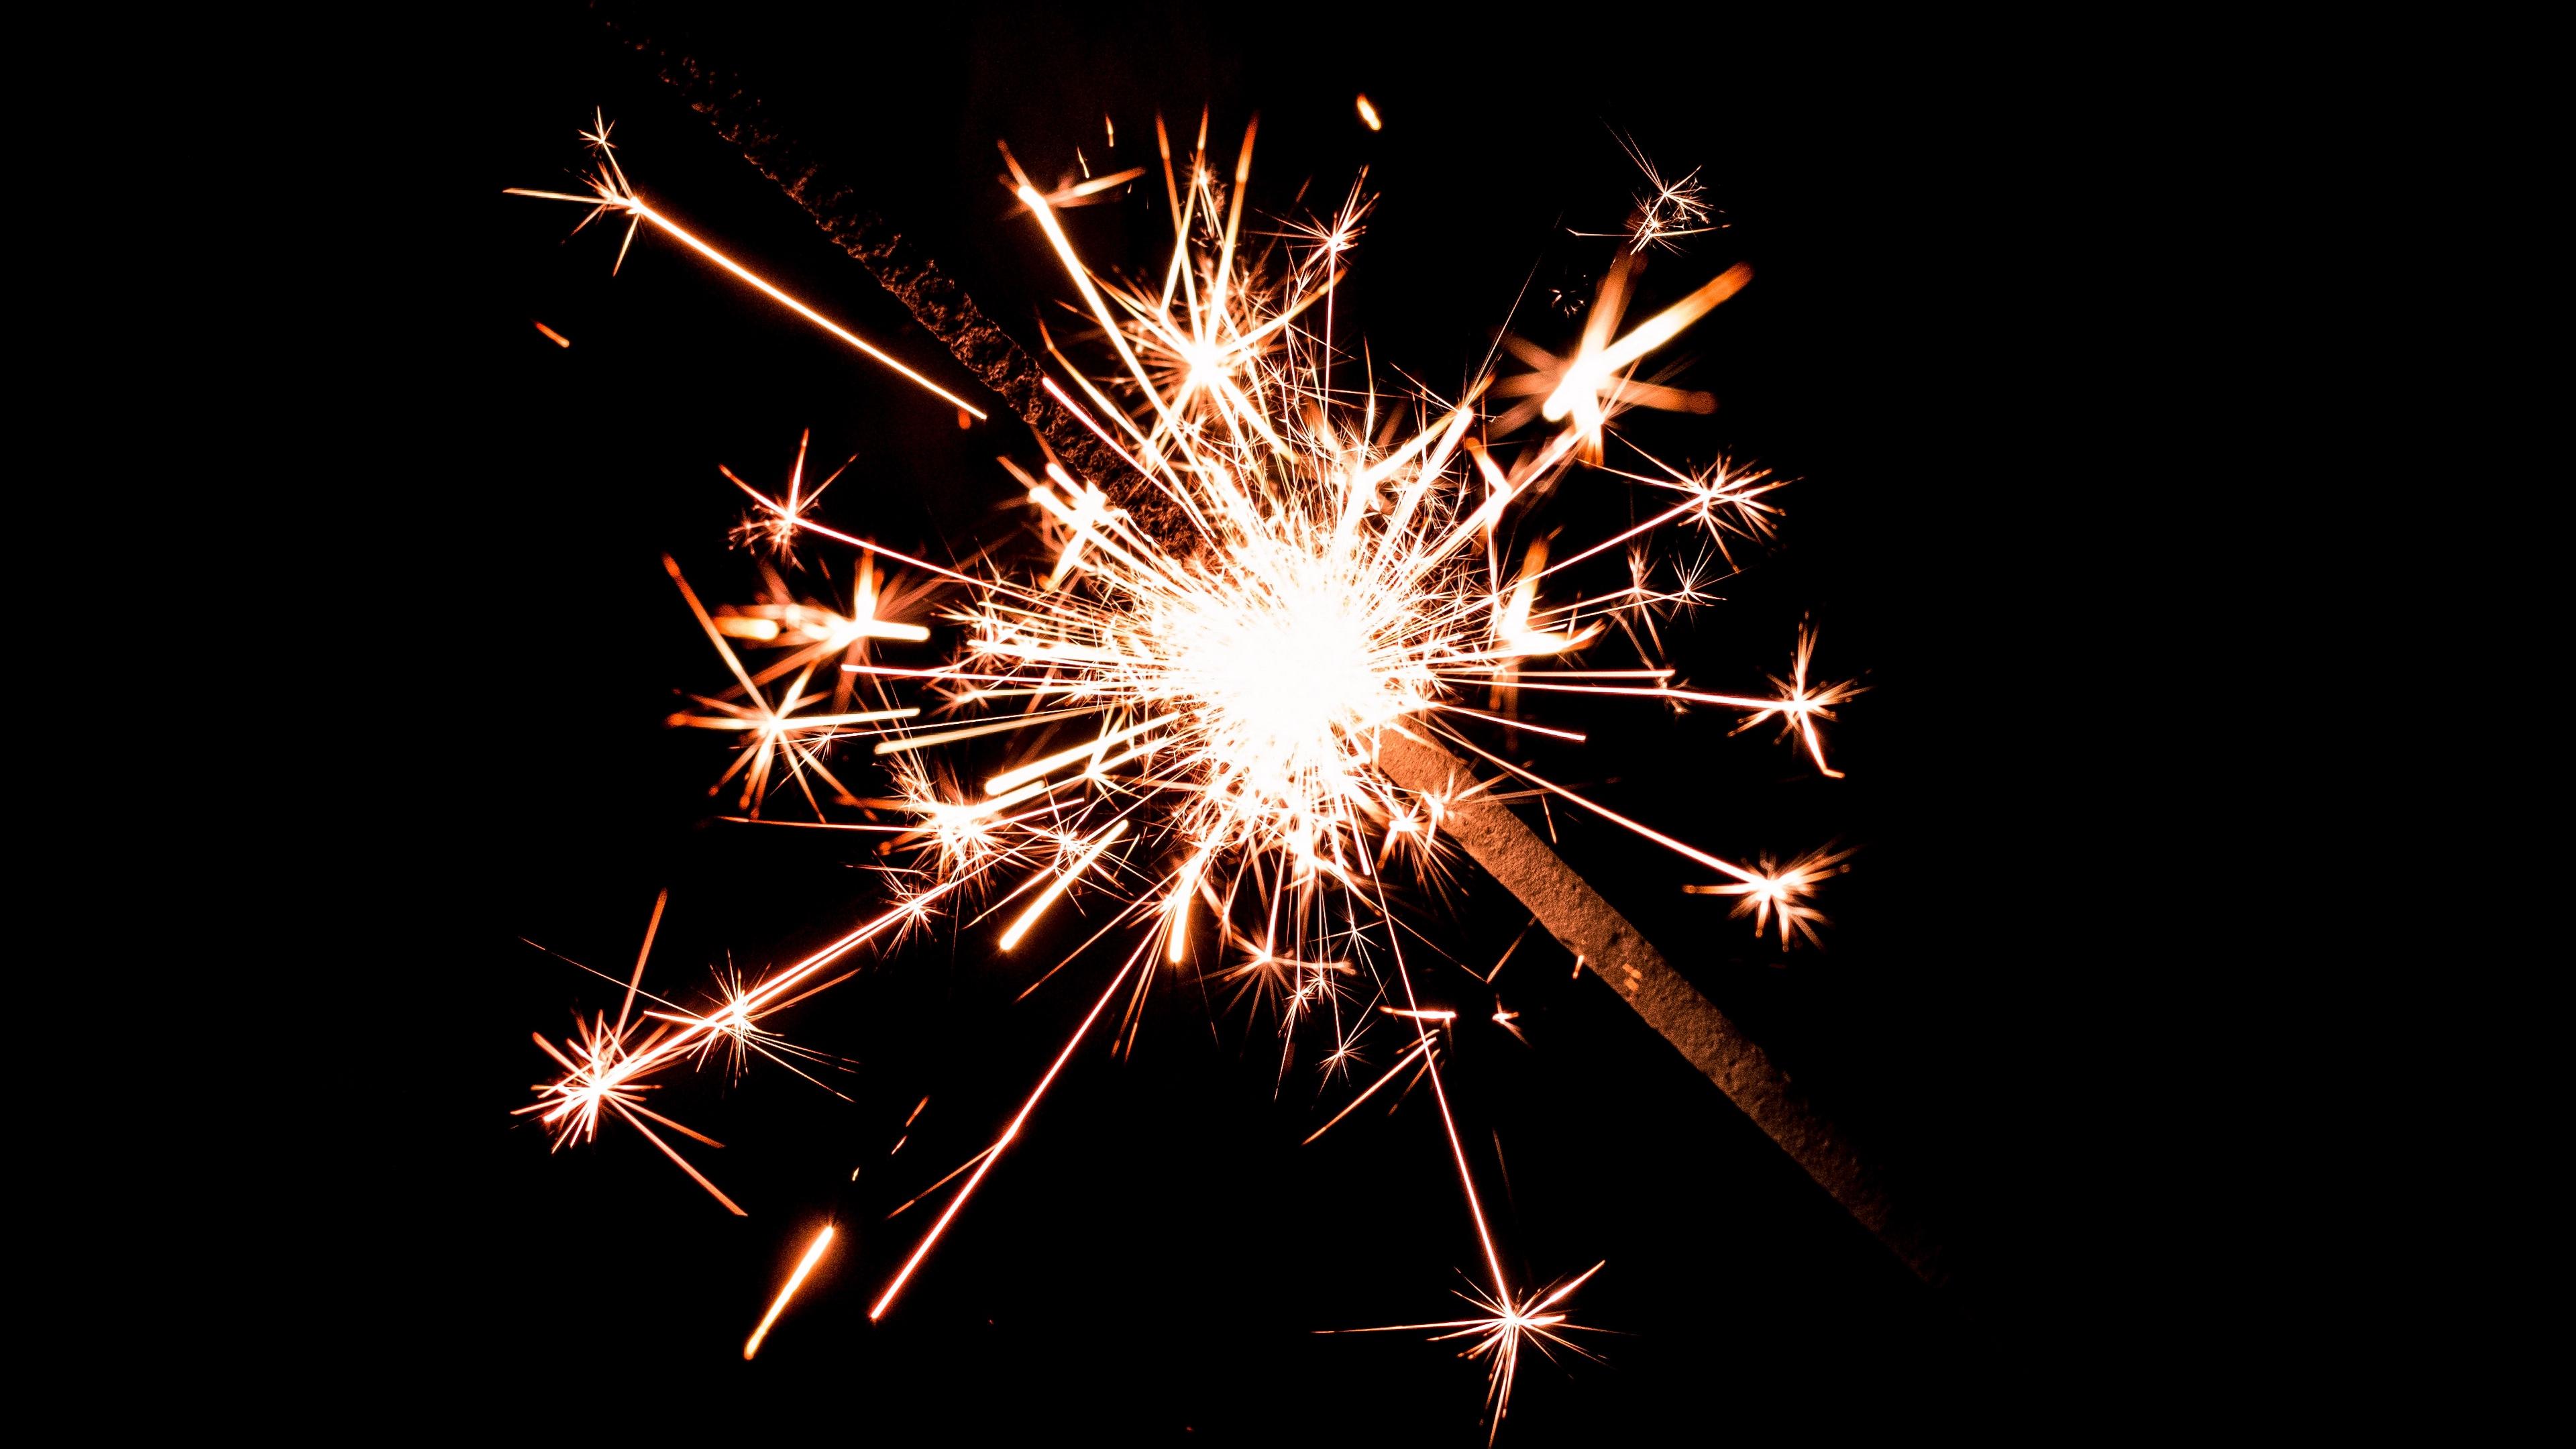 bengal fire sparks dark background shine 4k 1538344936 - bengal fire, sparks, dark background, shine 4k - Sparks, dark background, bengal fire